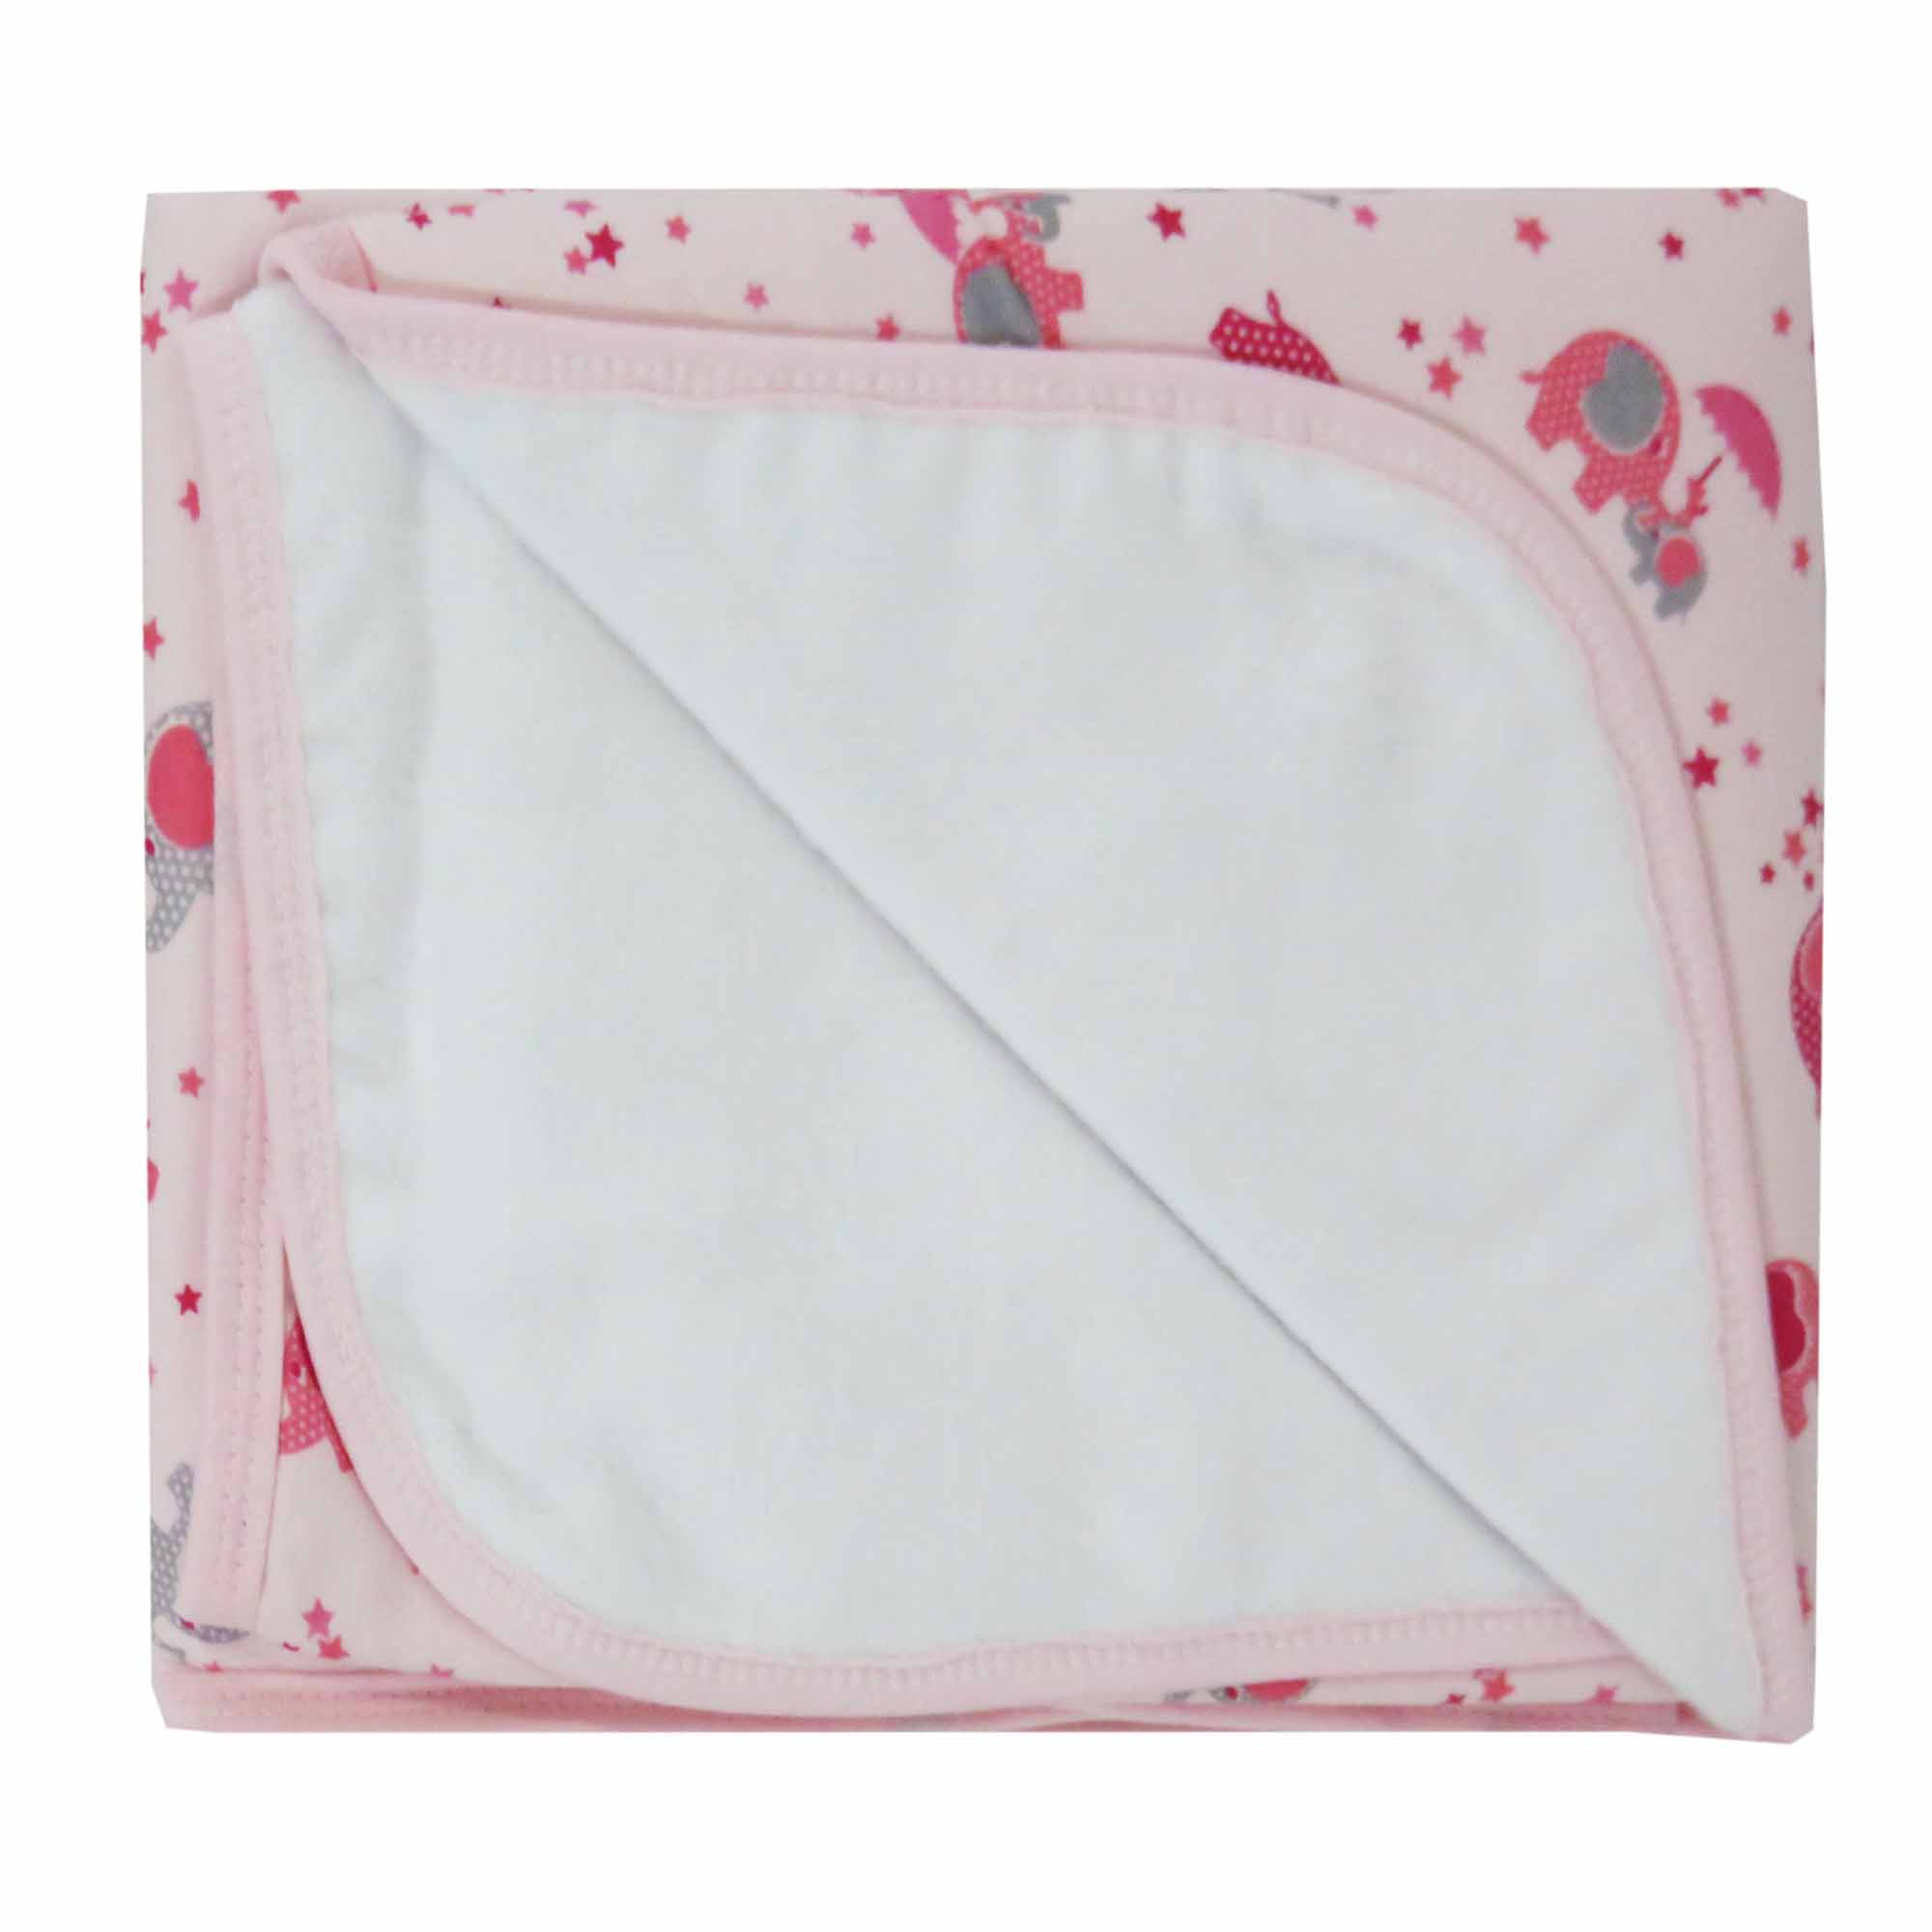 Cobertor Minasrey - Carícia Malhas - Dupla Face